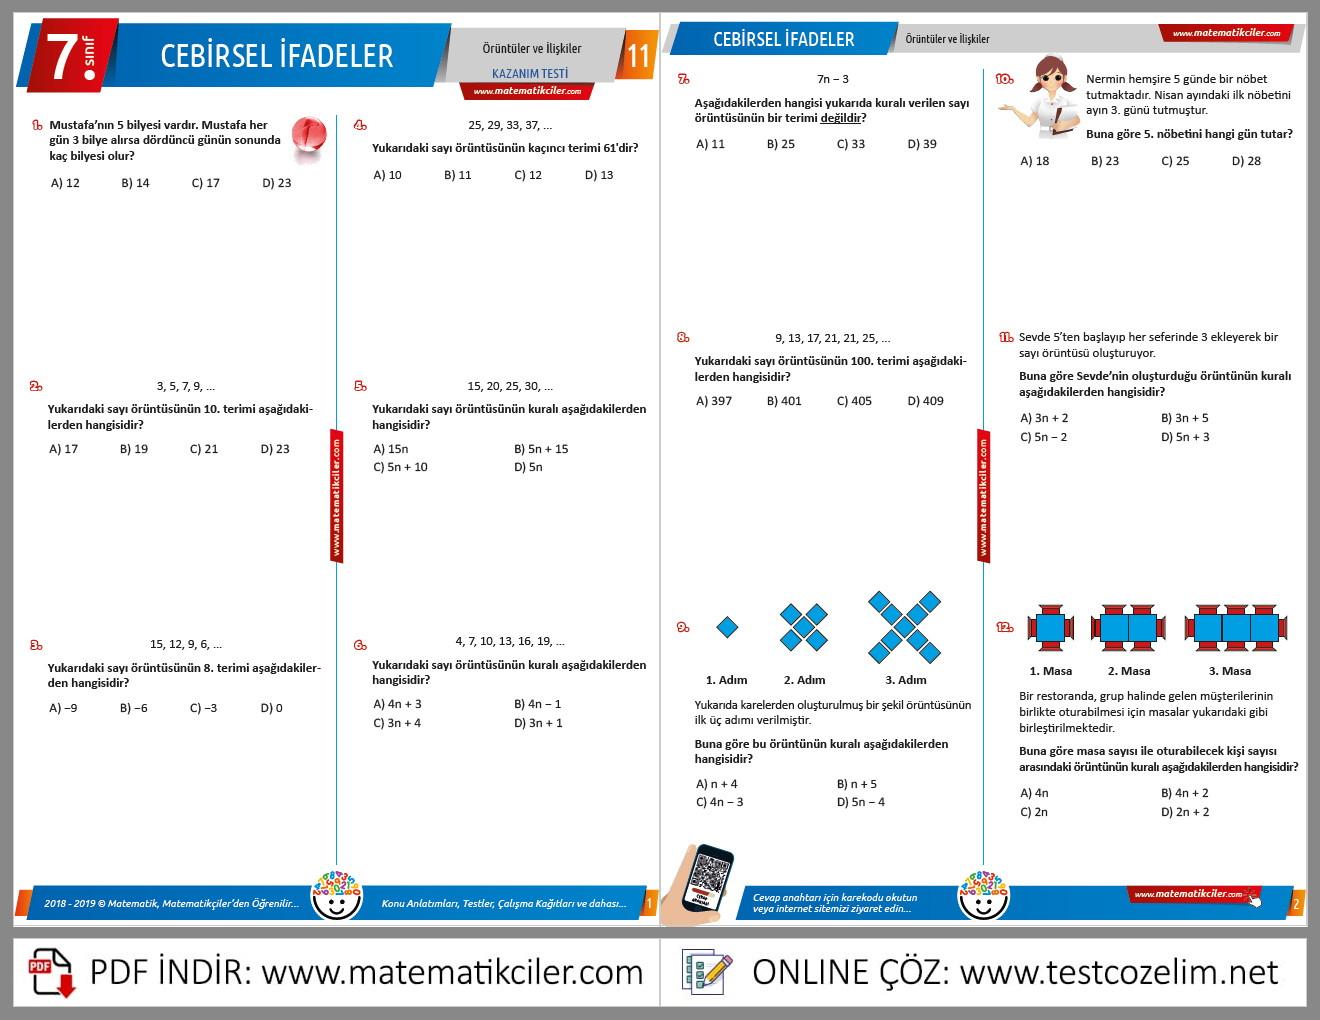 7 Sinif Oruntuler Testi Pdf Indir Matematikciler Com